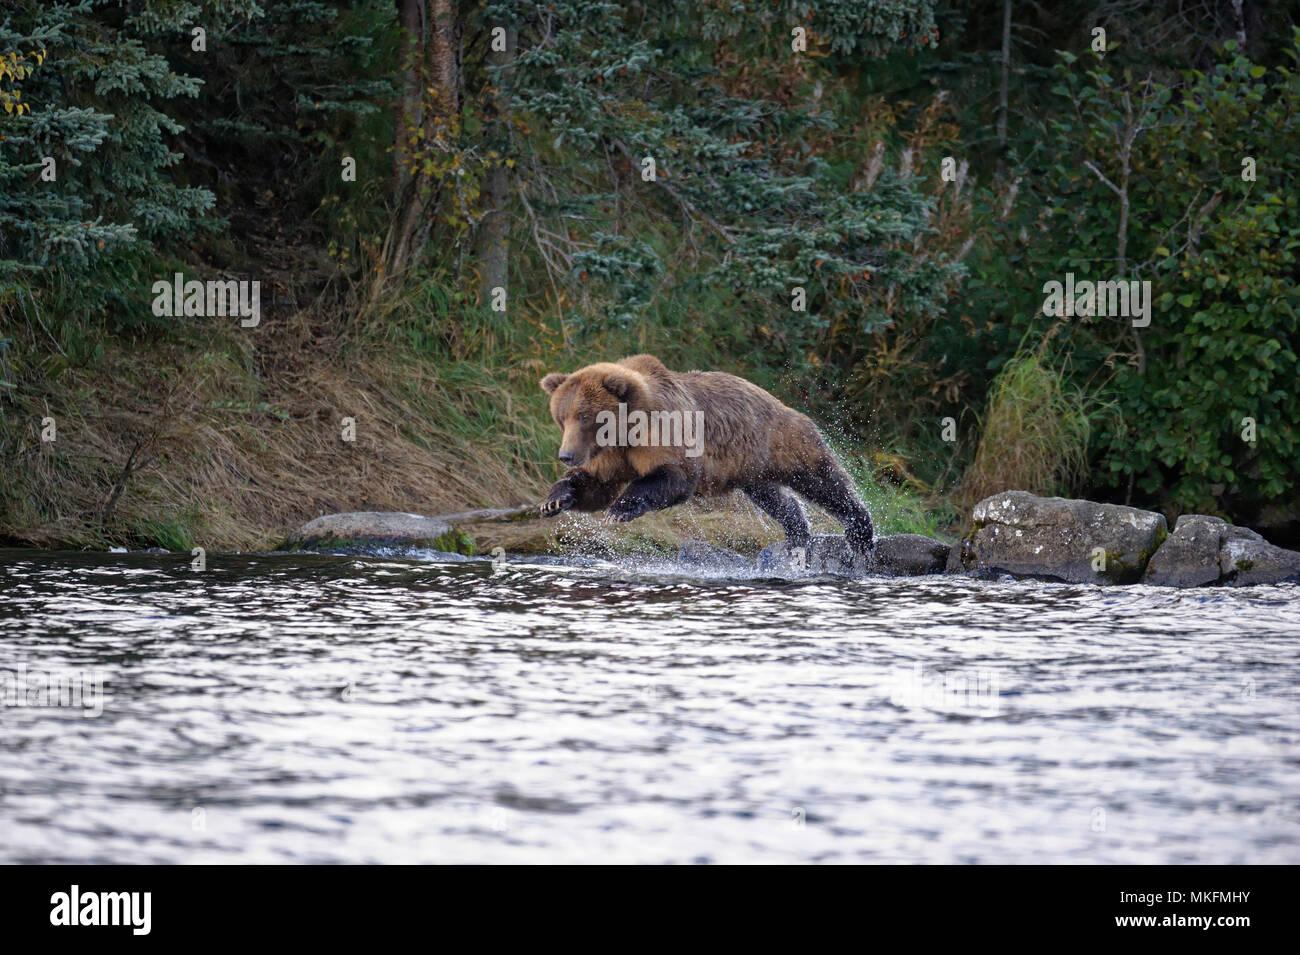 Grizzly (Ursus arctos horribilis) female jumping on salmons, Katmai National park, Alaska, USA Stock Photo